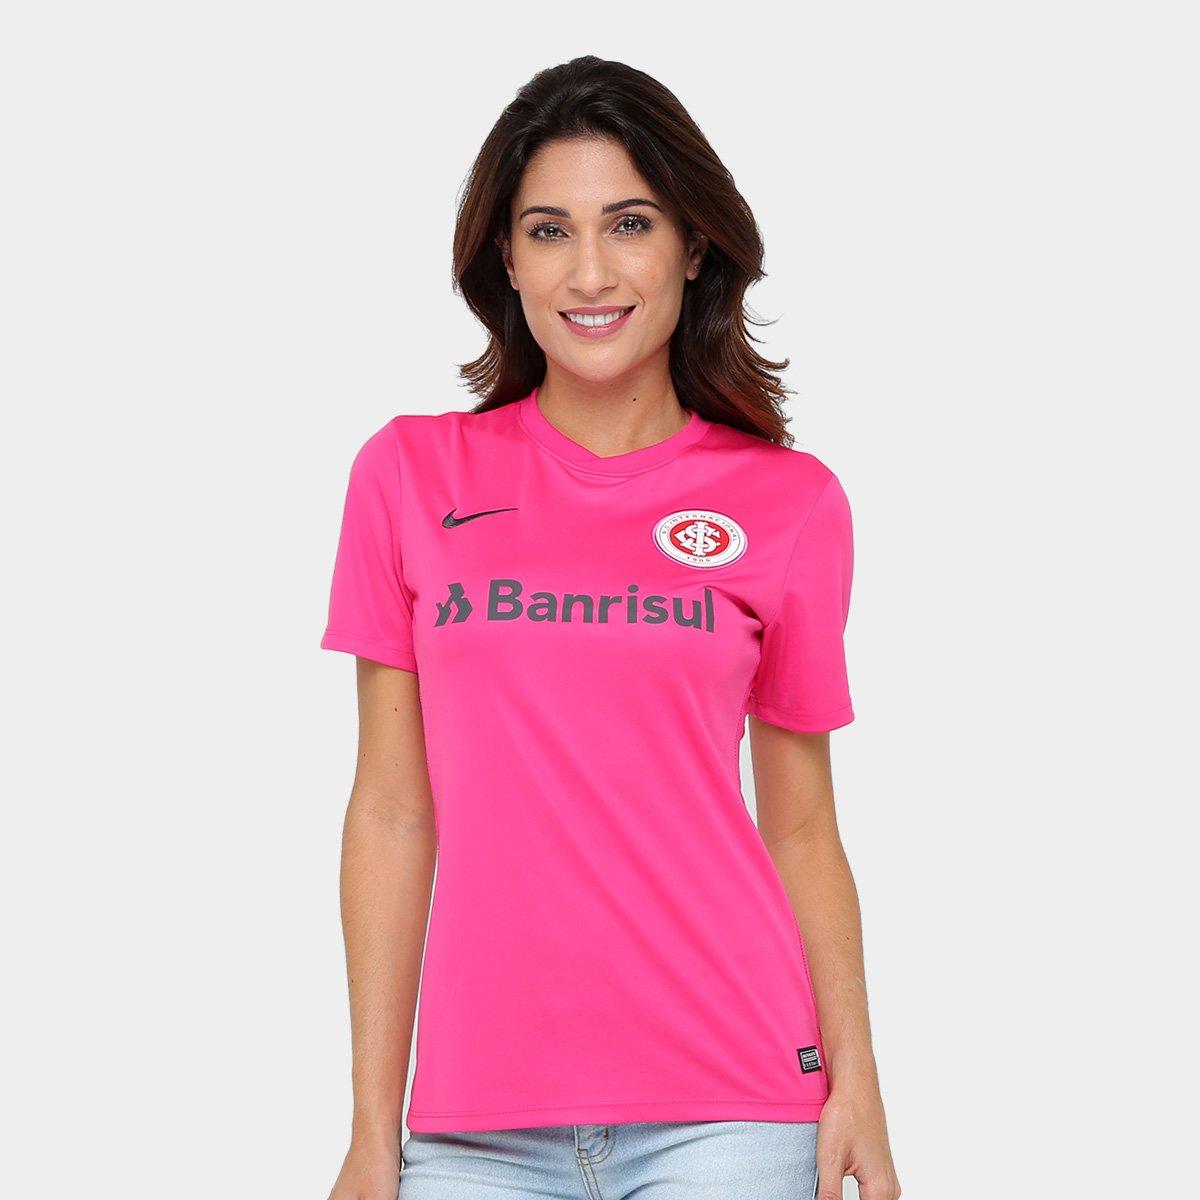 Camisa Internacional Outubro Rosa Nike Feminina 337a0b49f9bed